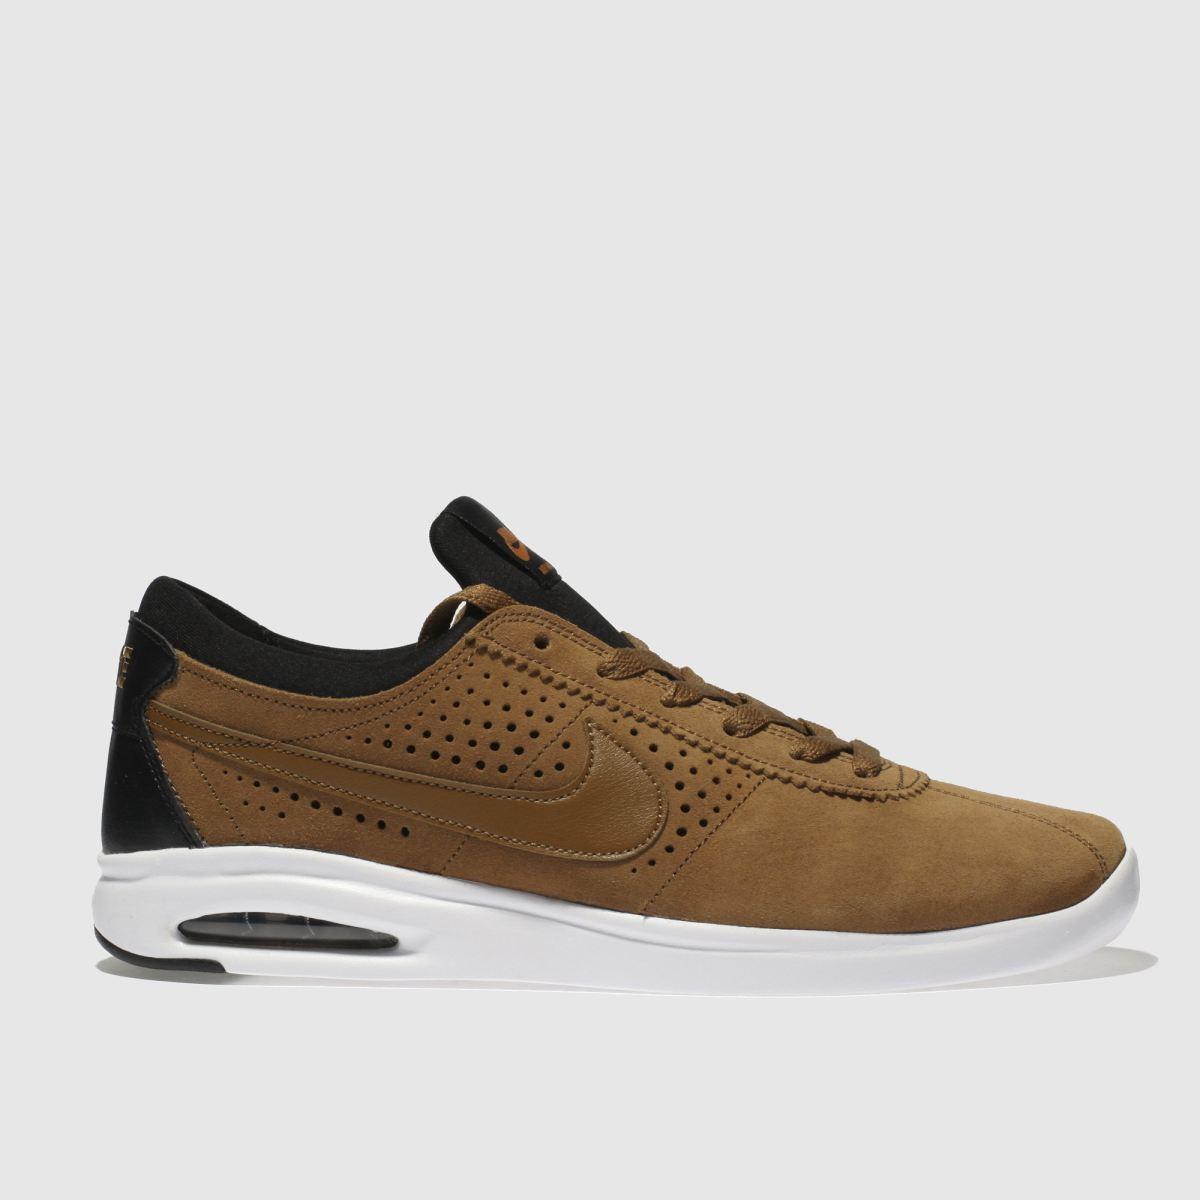 Nike SB Nike Sb Tan Air Max Bruin Vapor Trainers